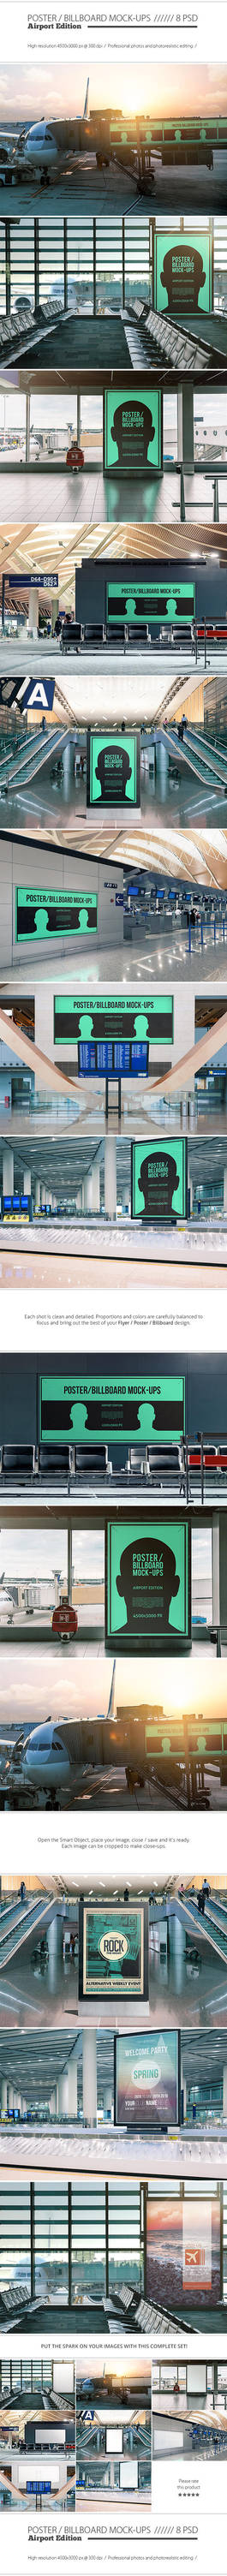 Poster / Billboard Mock-ups - Airport Edition by NuwanP